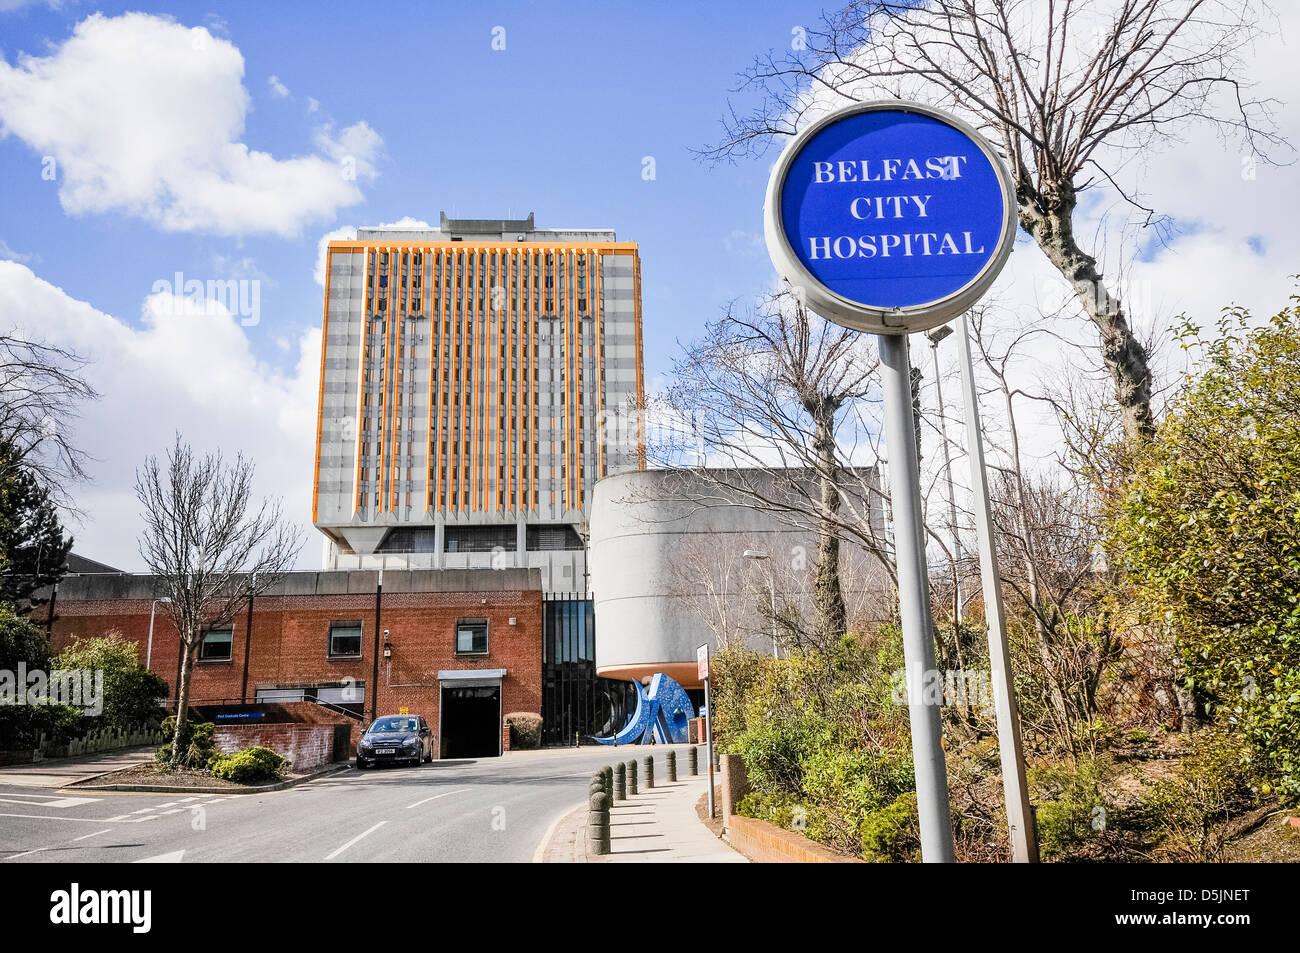 Belfast City Hospital - Stock Image